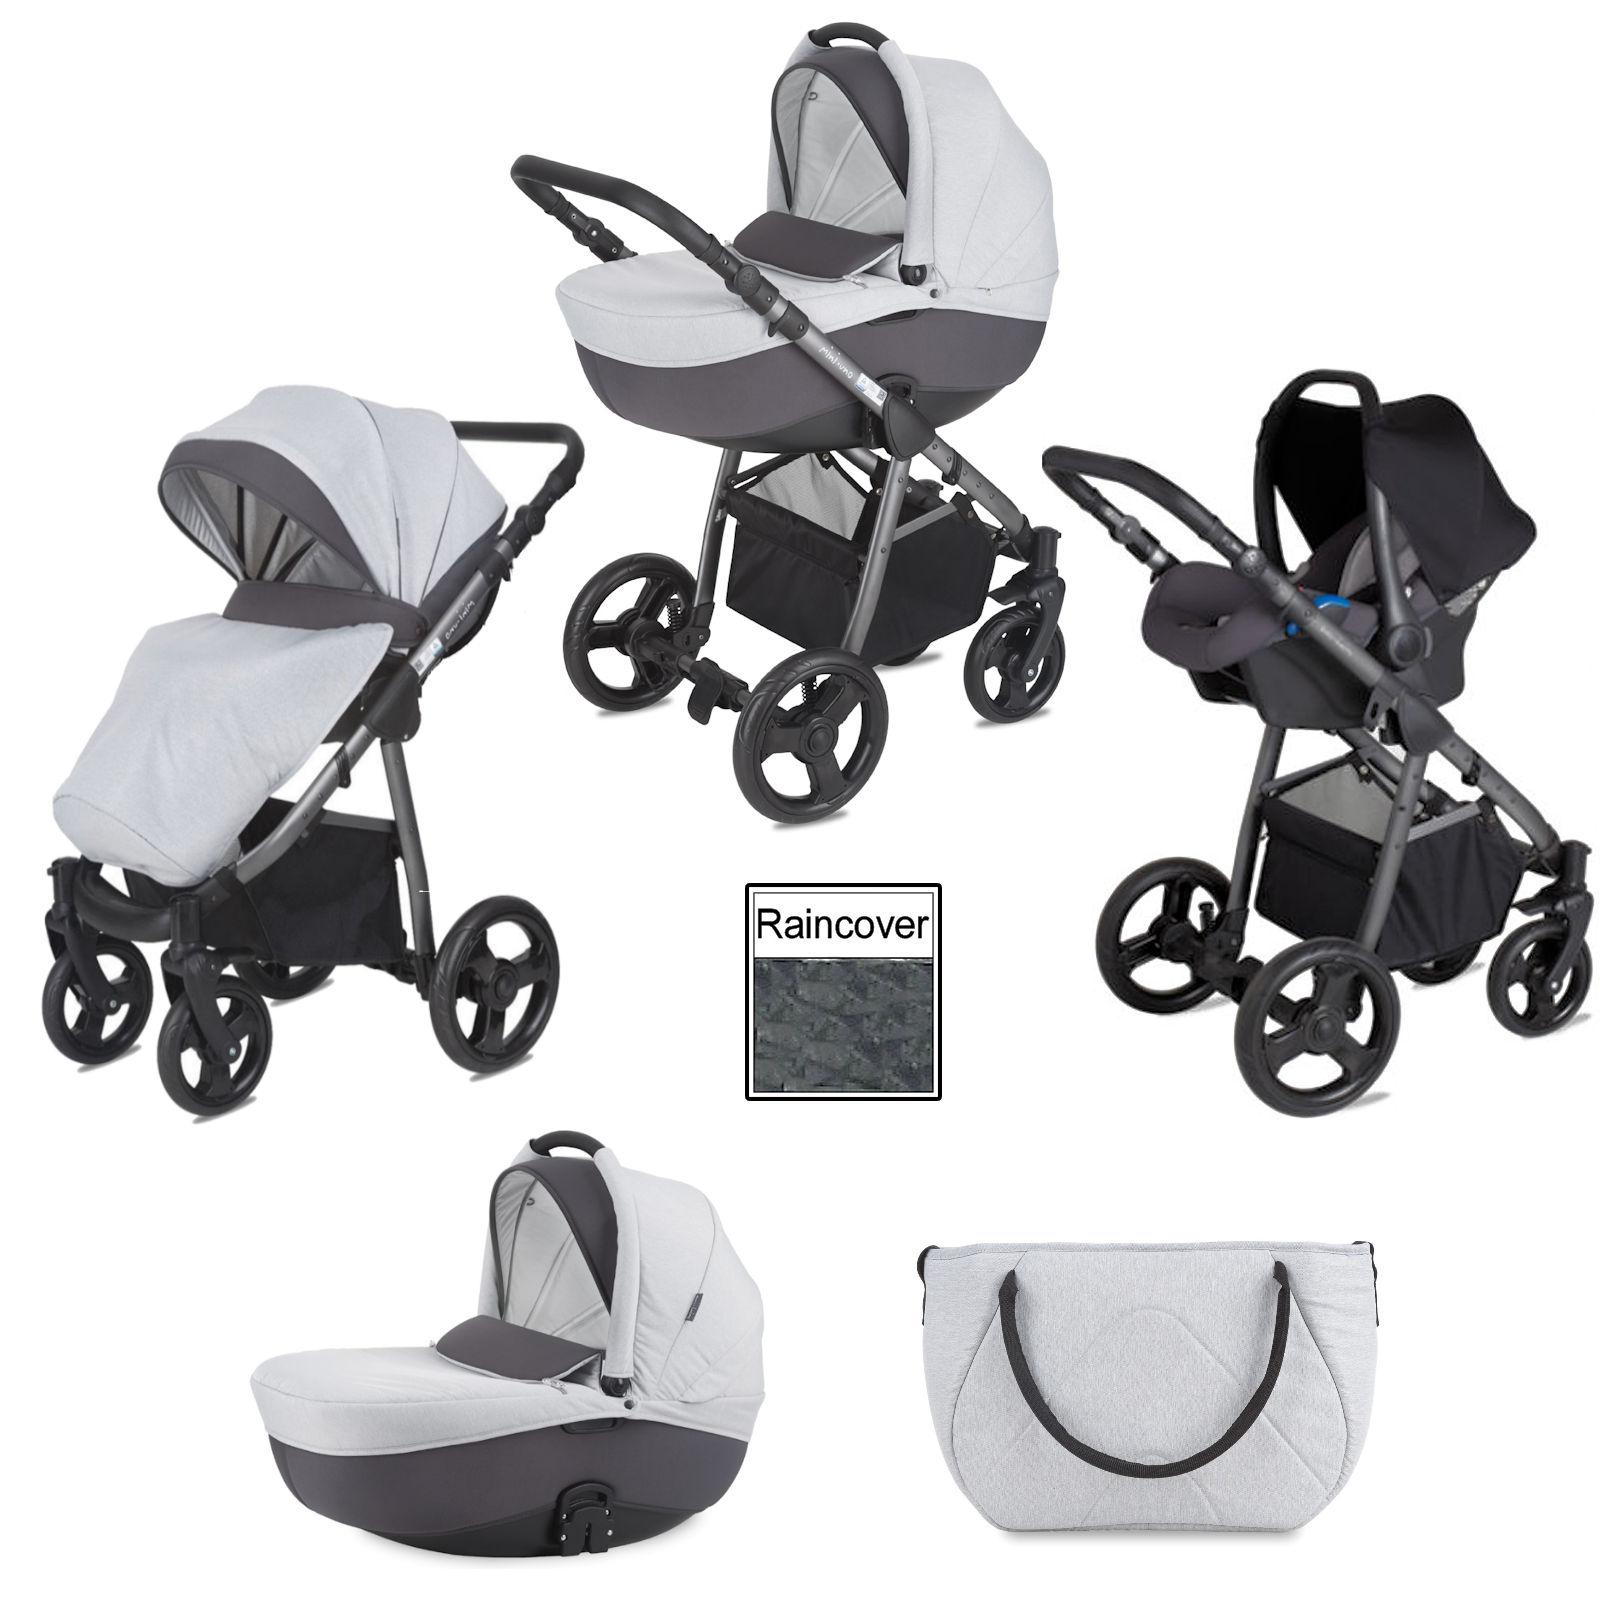 Mini Uno Stride Travel System 3-in-1 pram pushchair in Grey Melange for £269.95 delivered @ Online4Baby